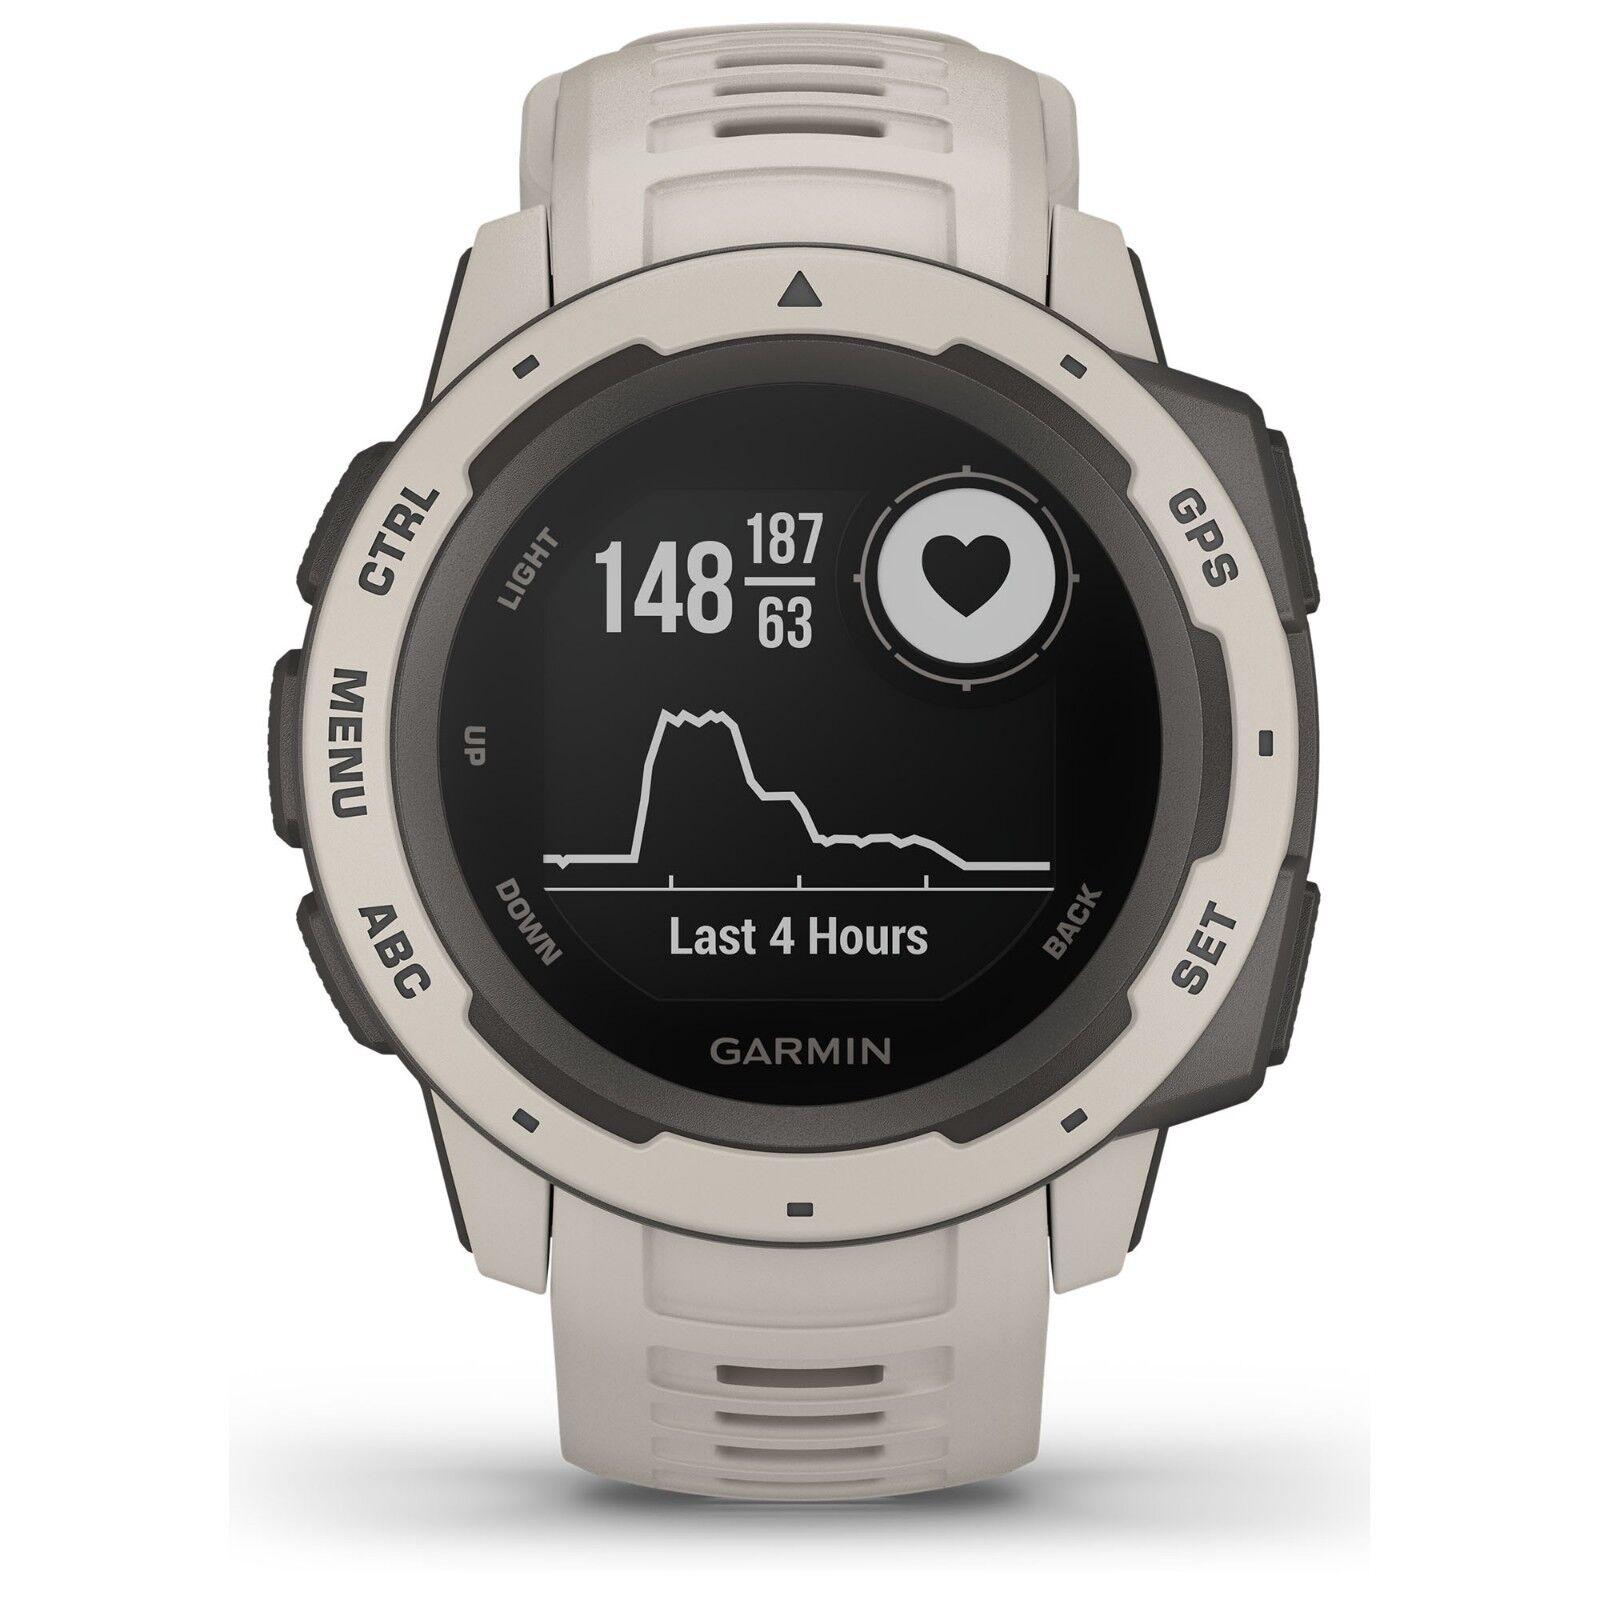 garmin-instinct-rugged-outdoor-gps-watch-tundra-wrist-hrm-glonass-010-02064-01